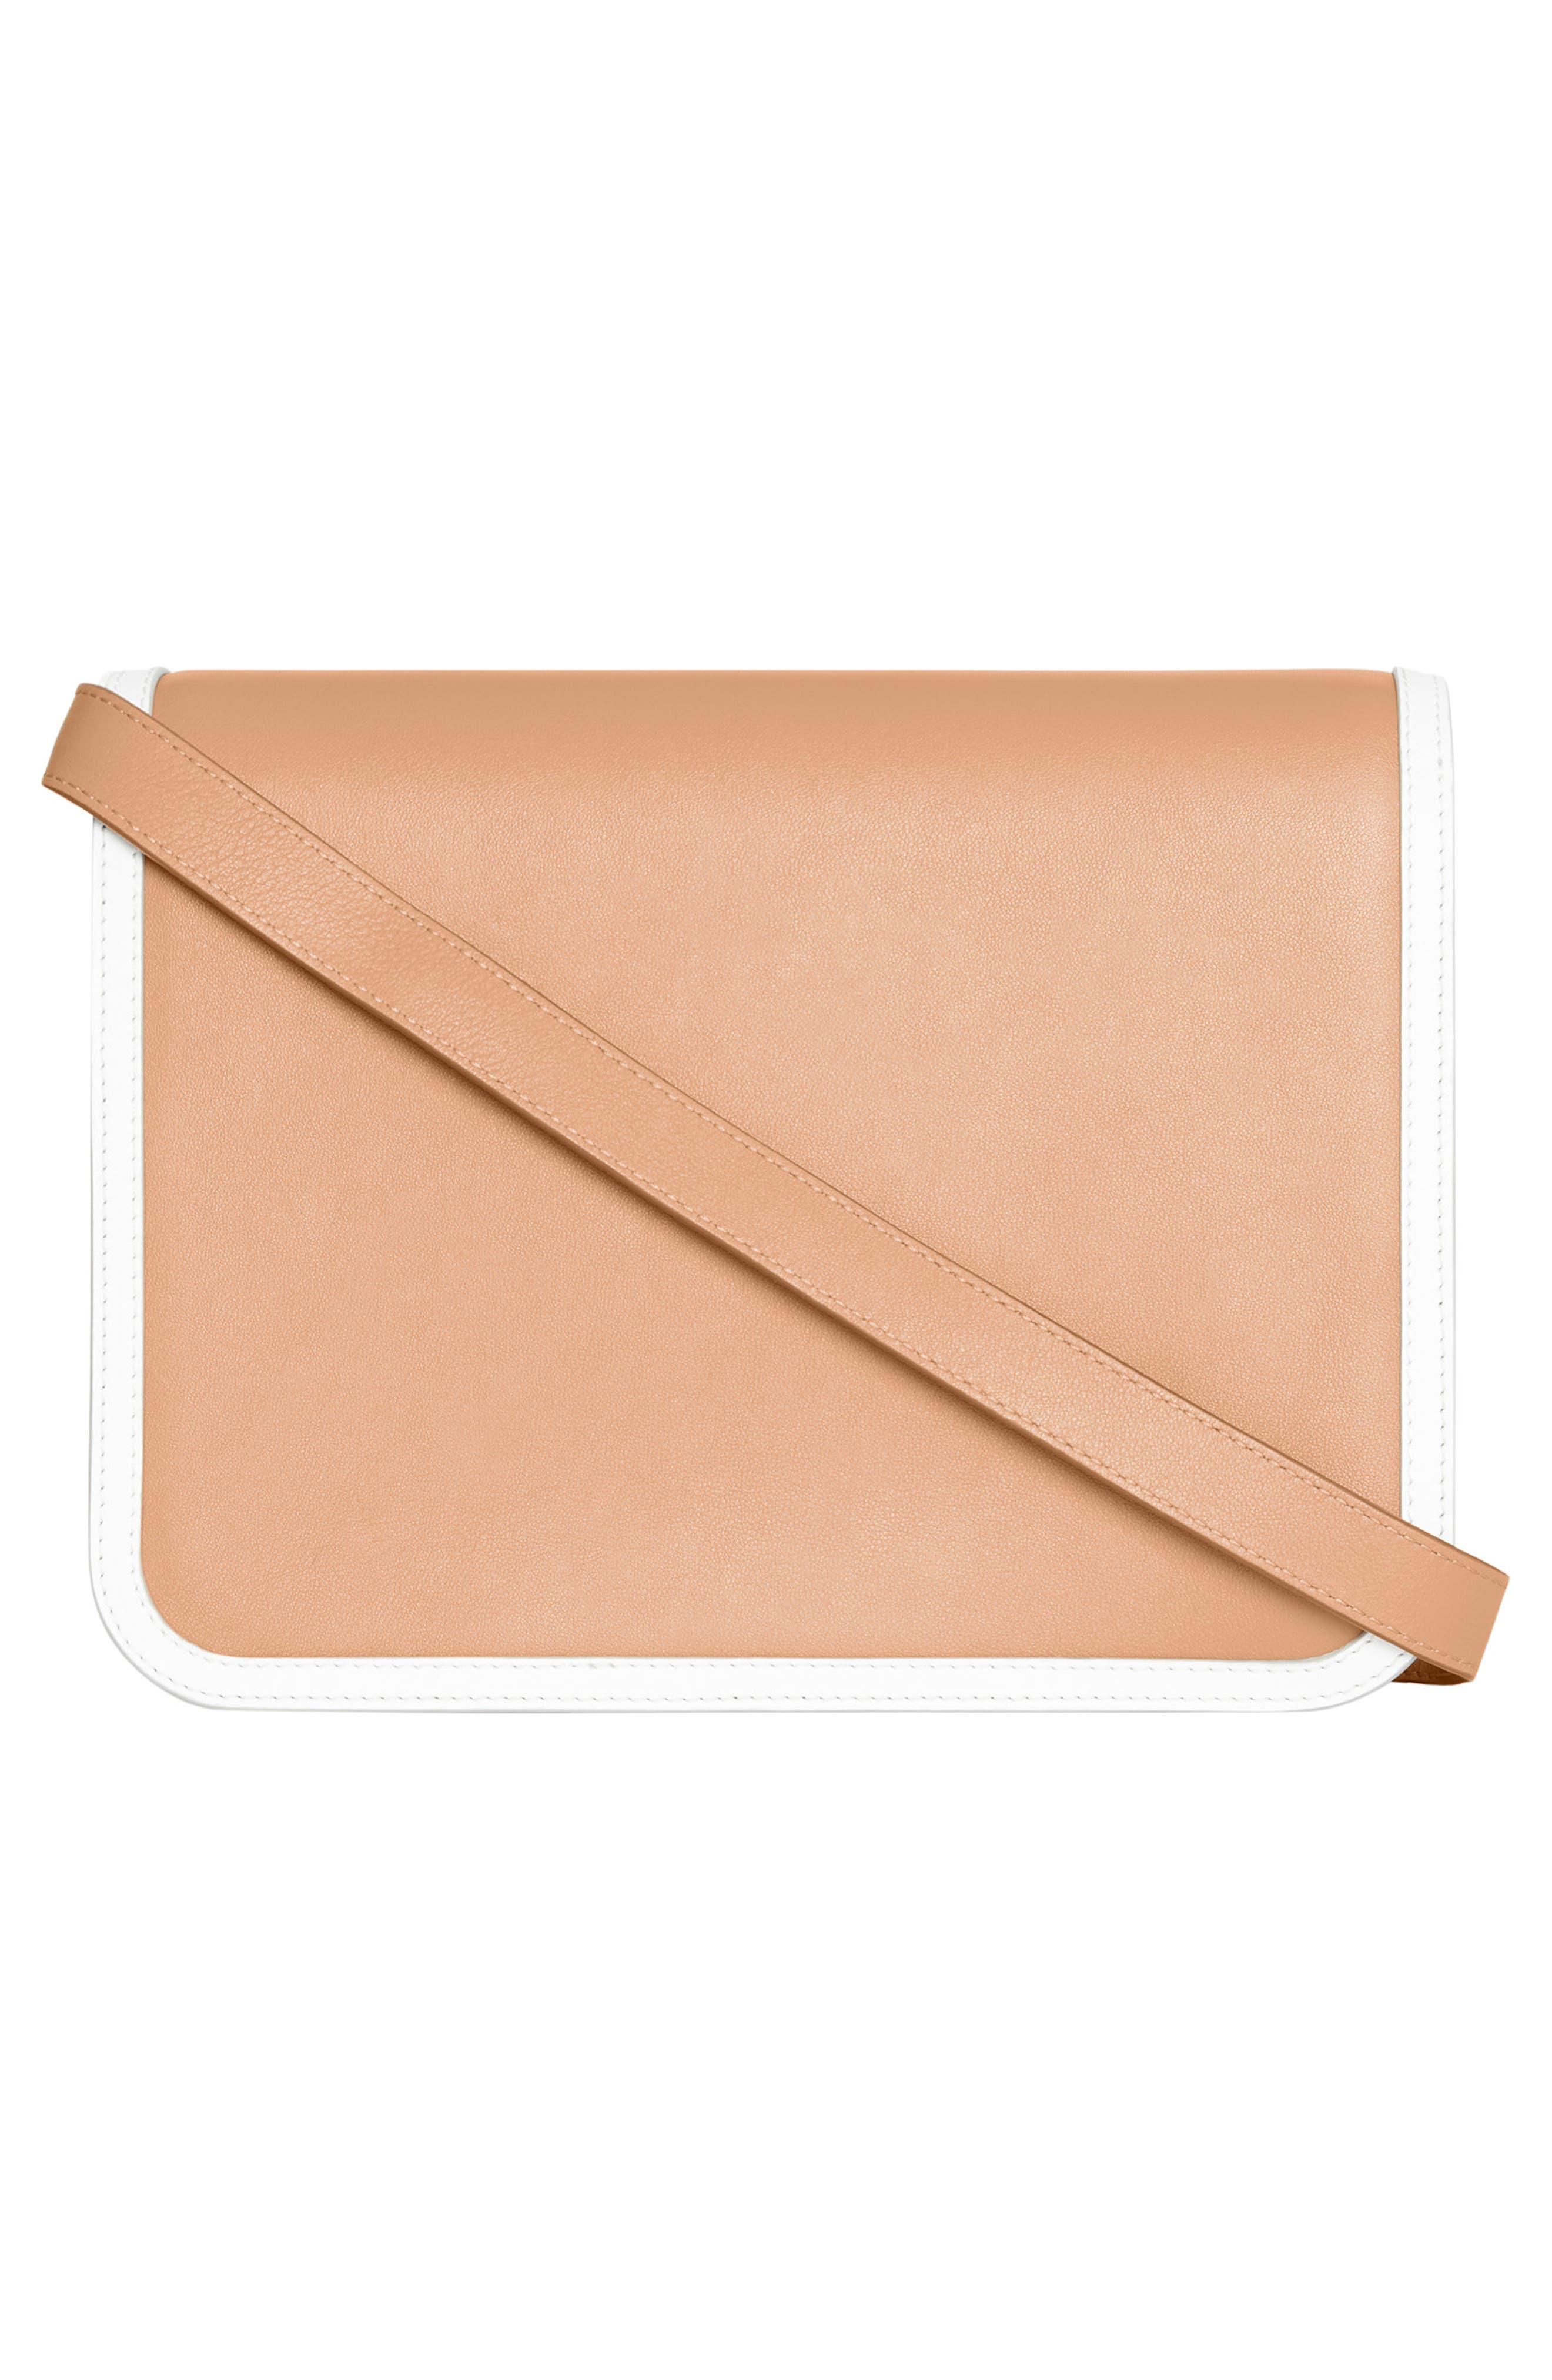 BURBERRY,                             Medium Two-Tone Leather TB Bag,                             Alternate thumbnail 2, color,                             CHALK WHITE/ LIGHT CAMEL